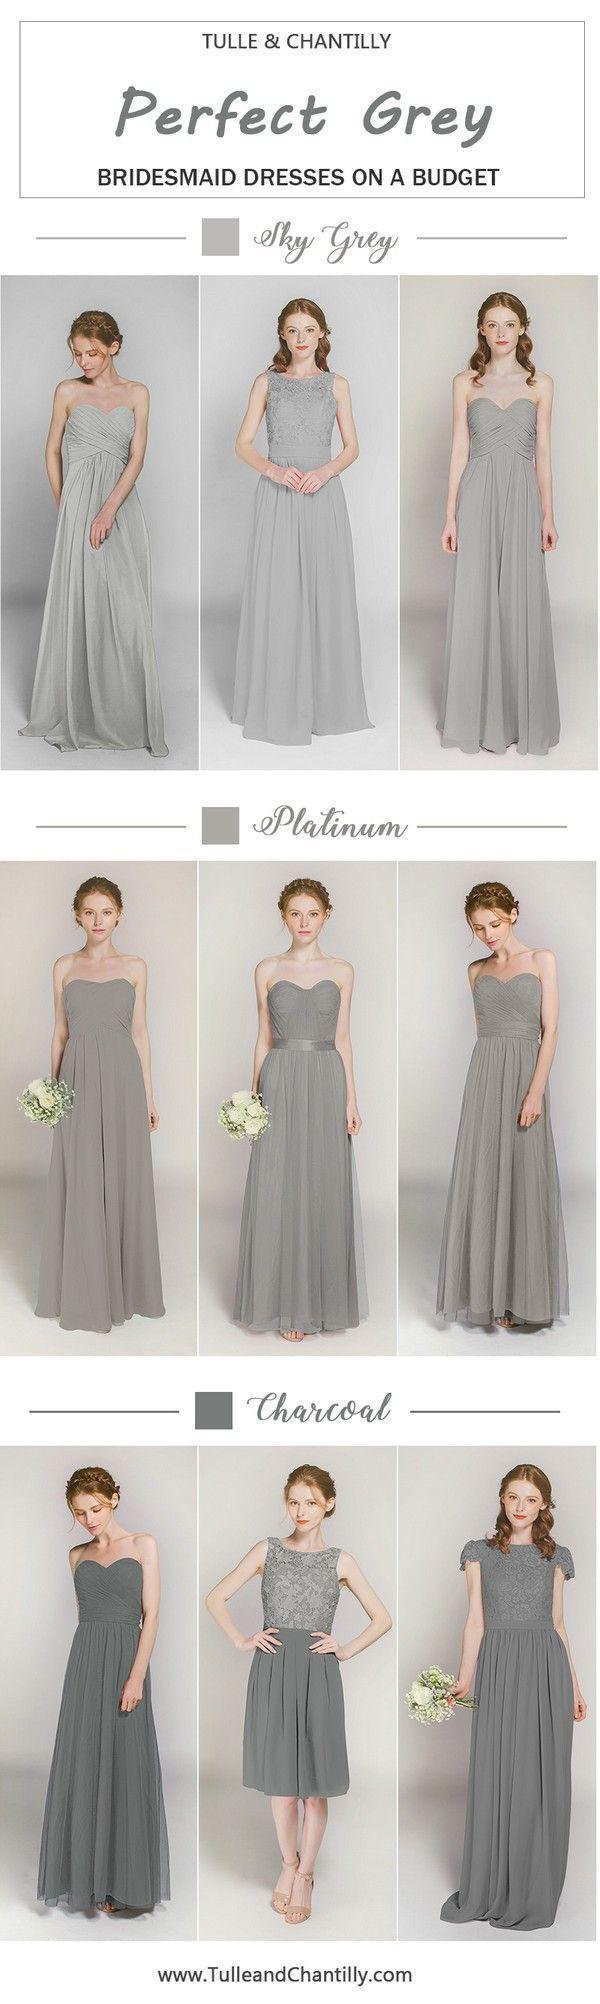 affordable sky grey bridesmaid dresses